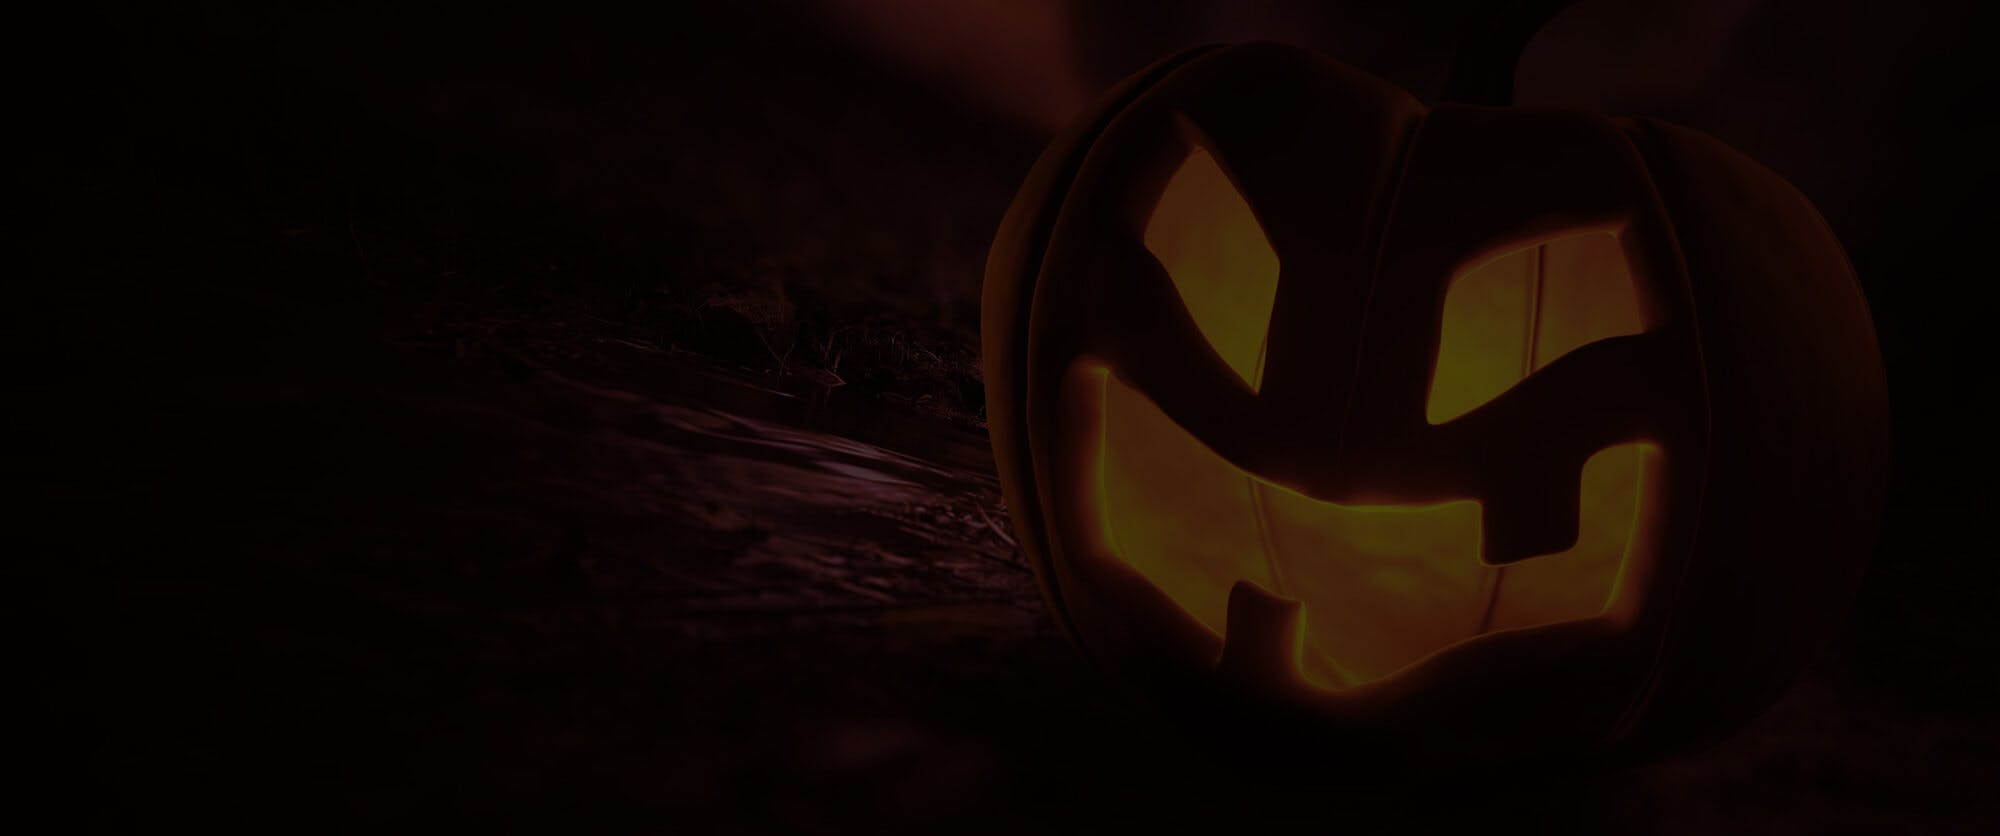 70% OFF | Halloween Serum Presets